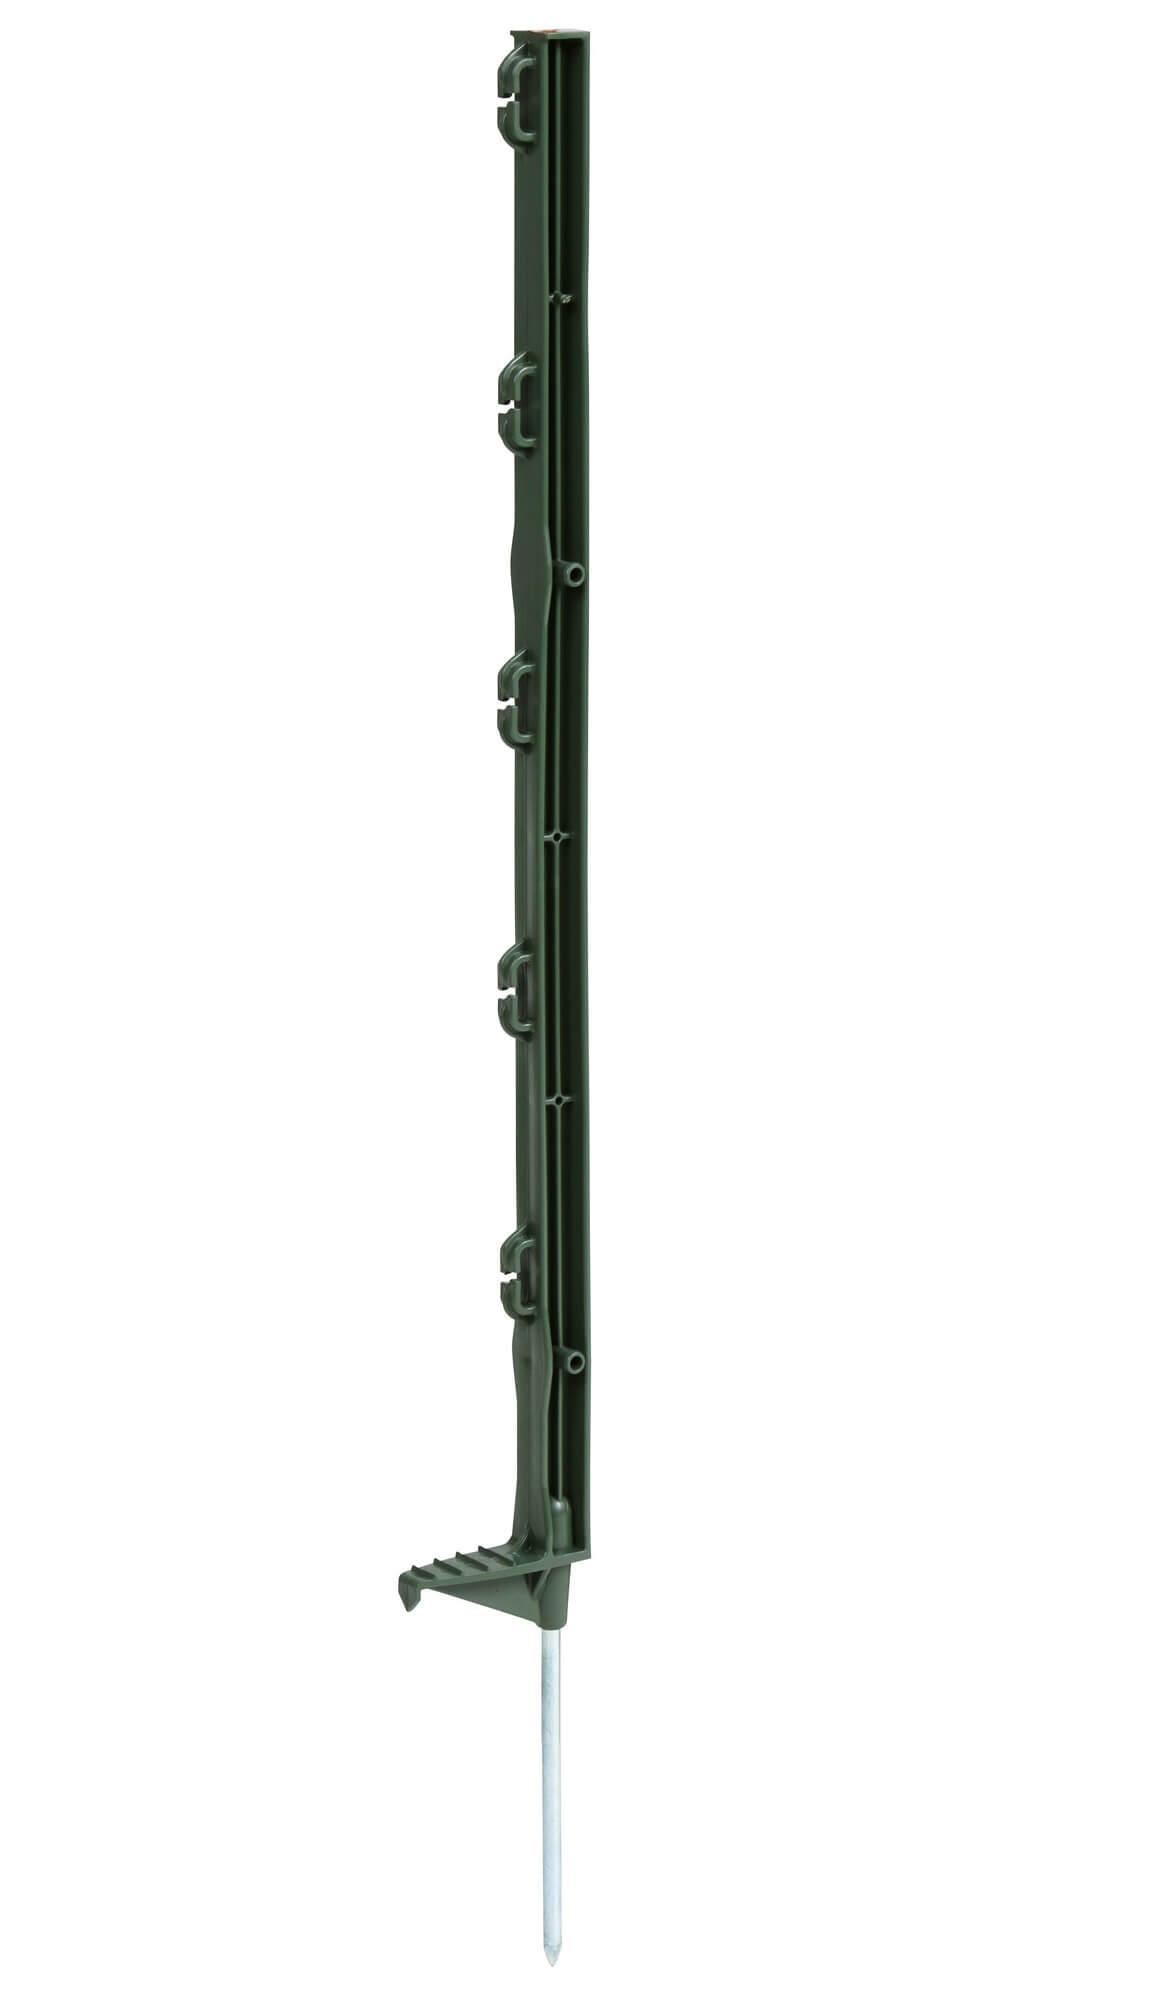 Kunststoffpfahl Eco grün 70 cm - Einzeltritt